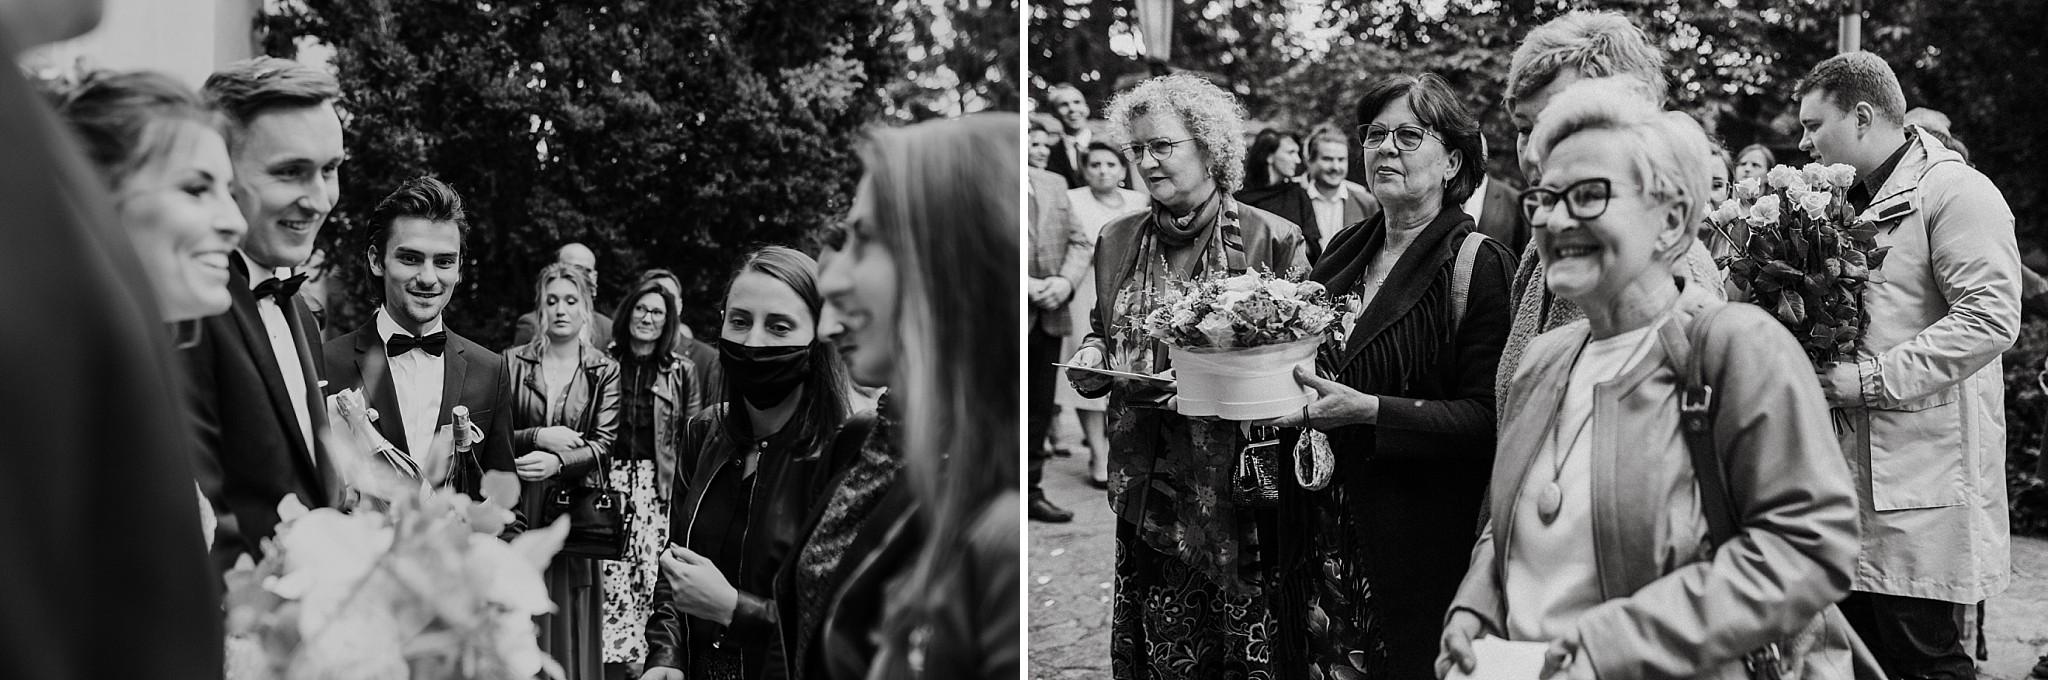 fotograf poznan wesele dobra truskawka piekne wesele pod poznaniem wesele w dobrej truskawce piekna para mloda slub marzen slub koronawirus slub listopad wesele koronawirus 230